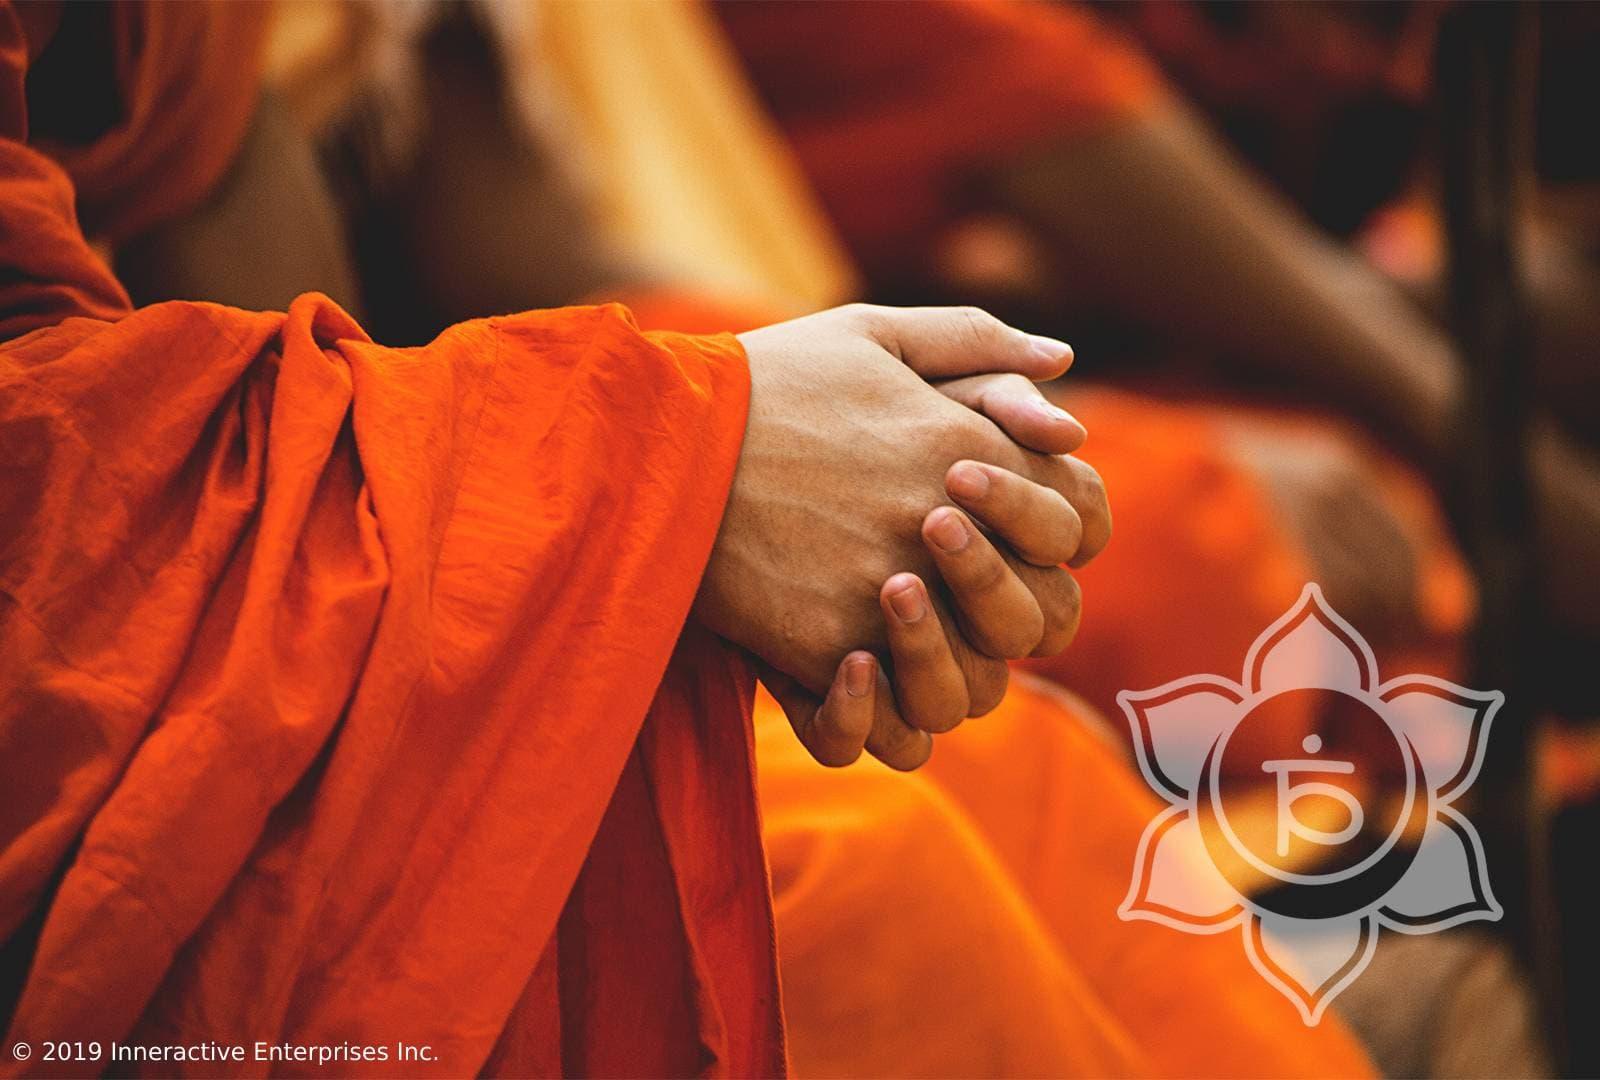 spiritual meaning of colors orange